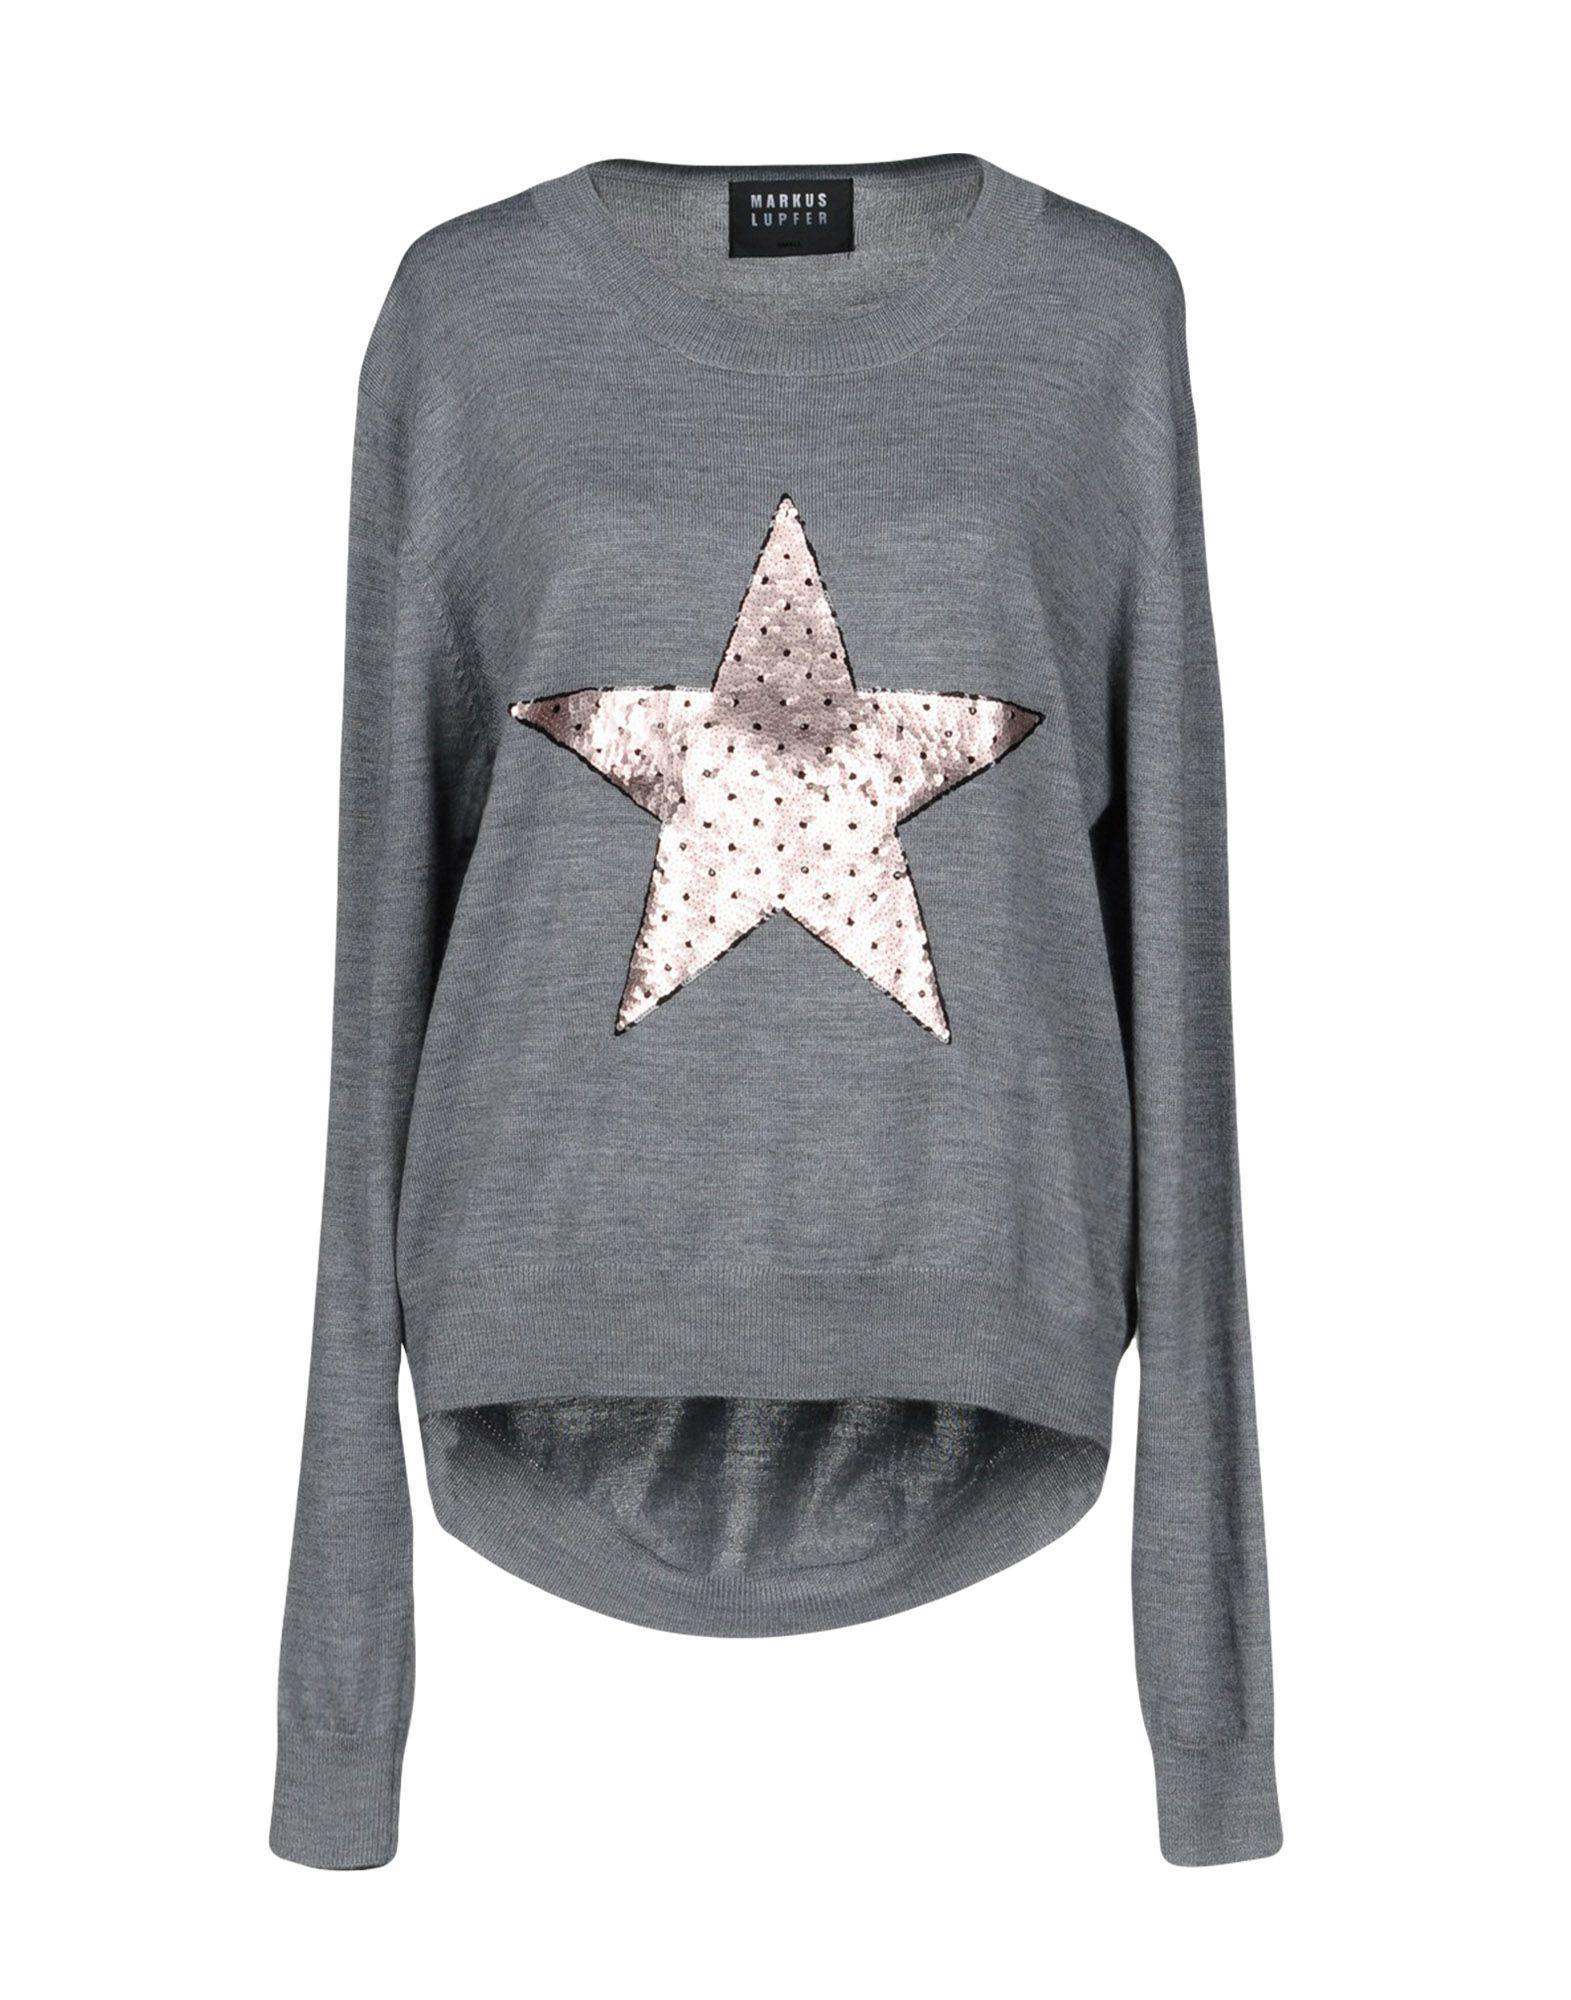 Markus Lupfer Sweater In Grey